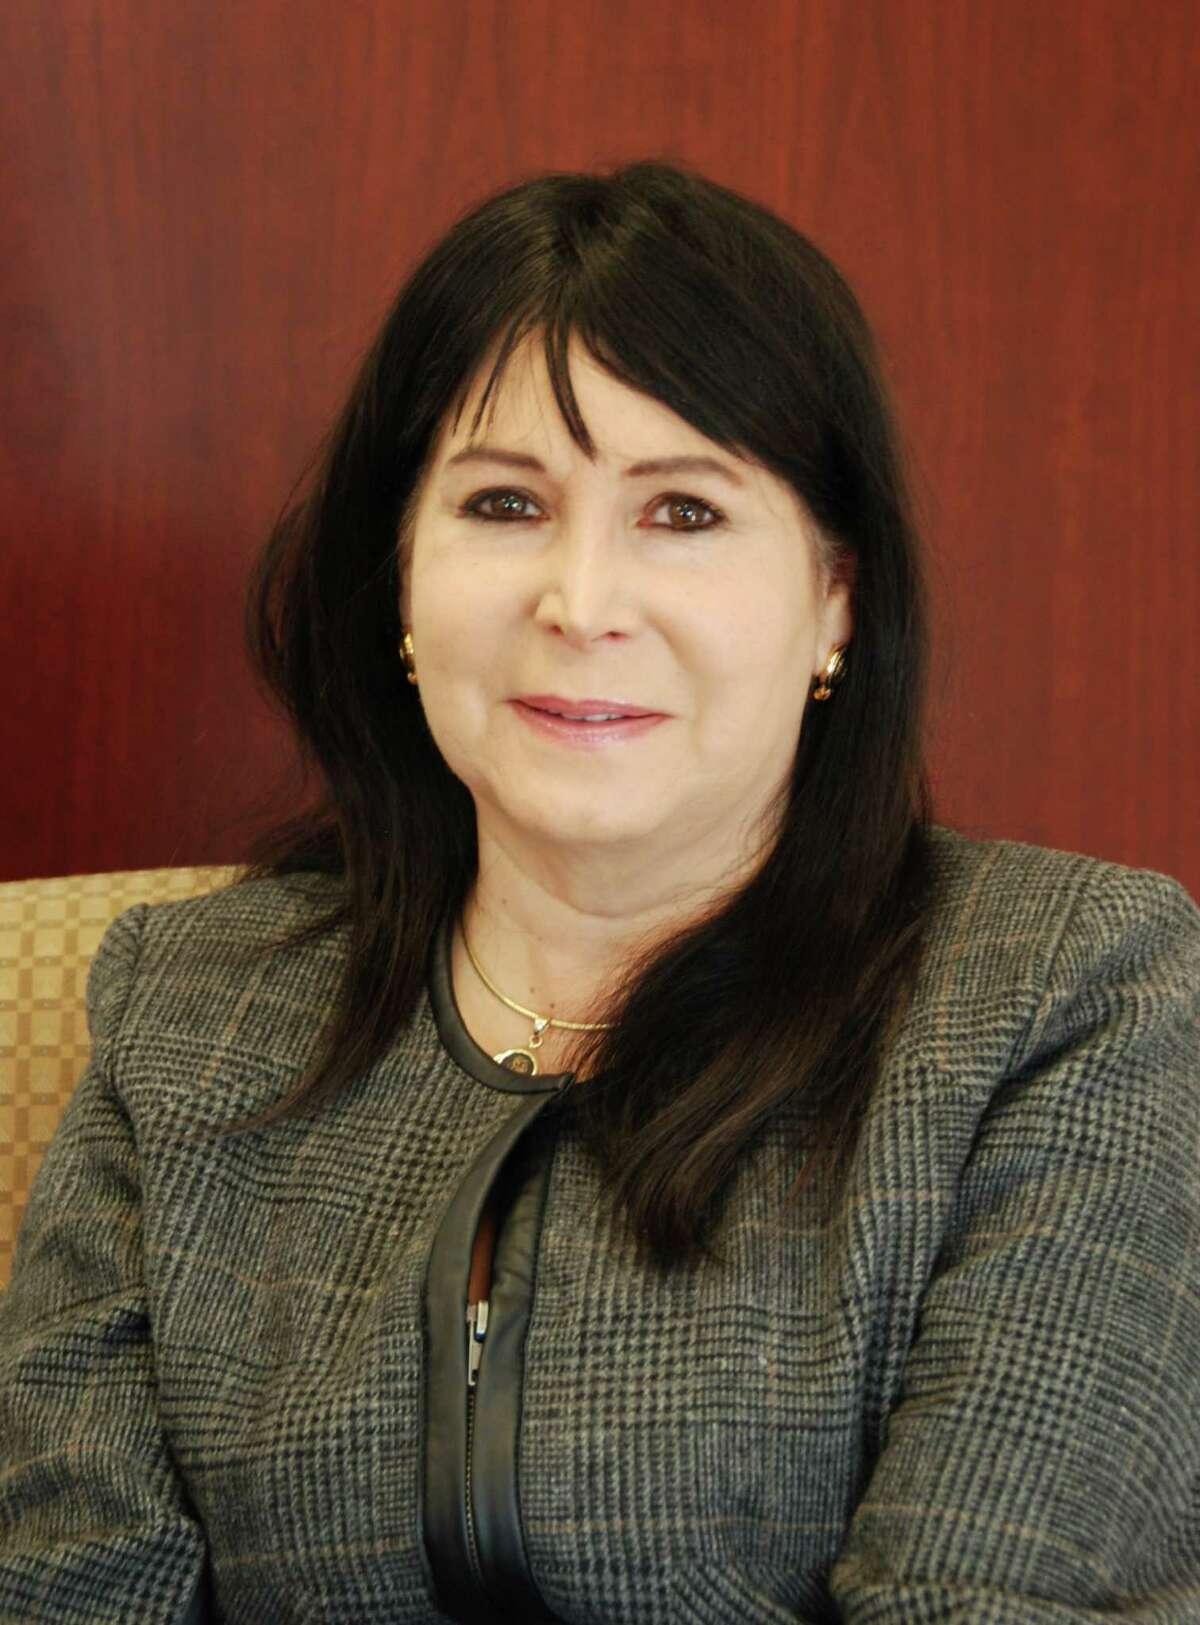 Susan Kornberg has been named vice president, commercial lender, at Bankwell.